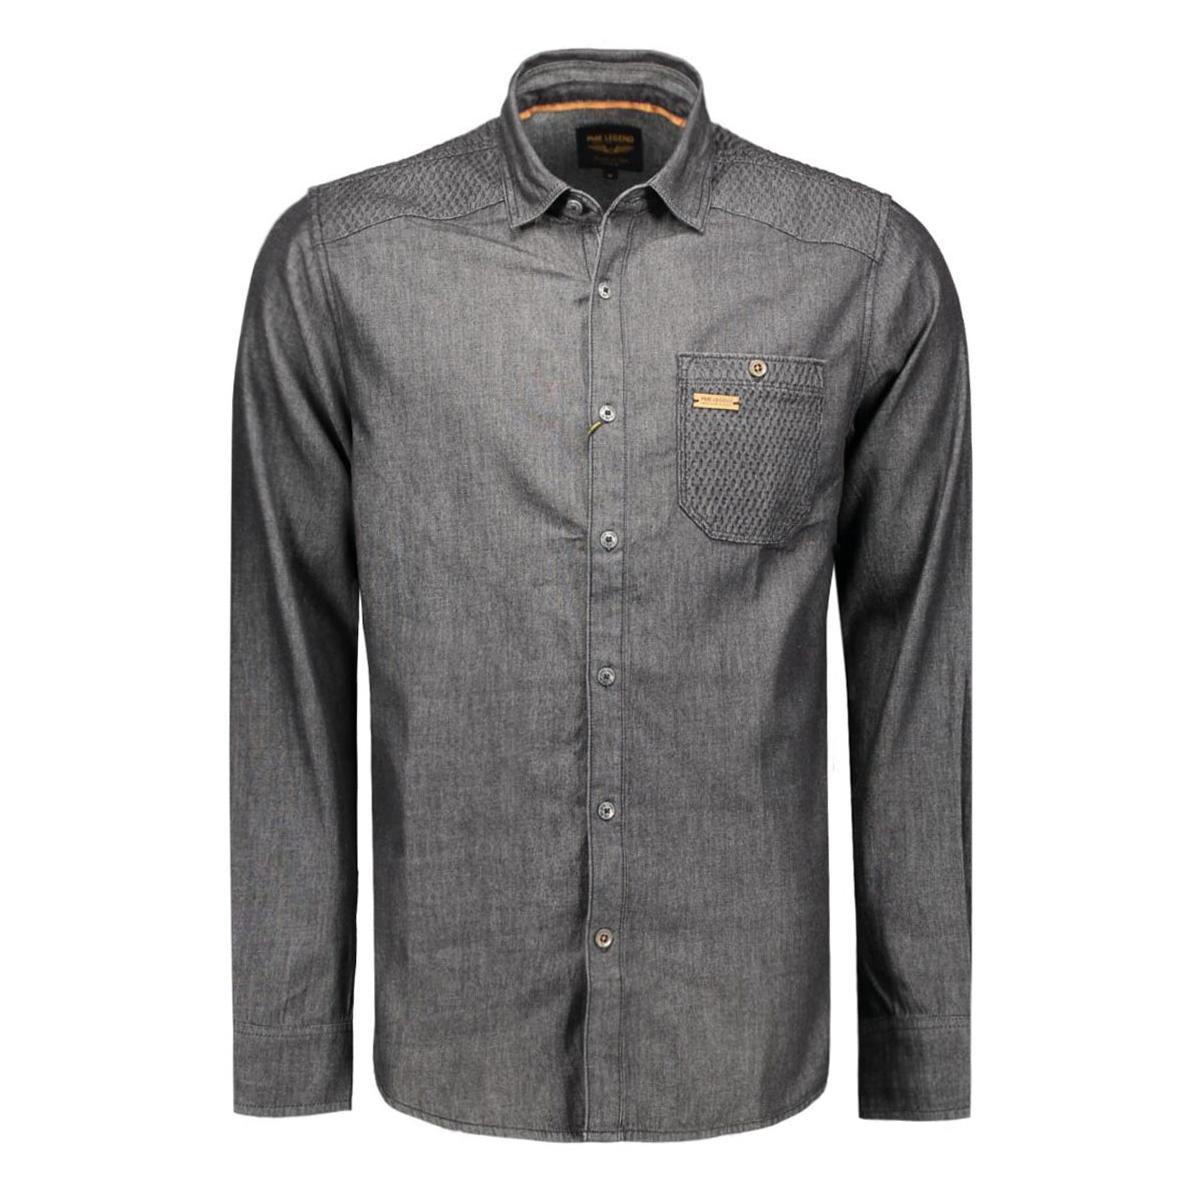 psi66233 pme legend overhemd 995